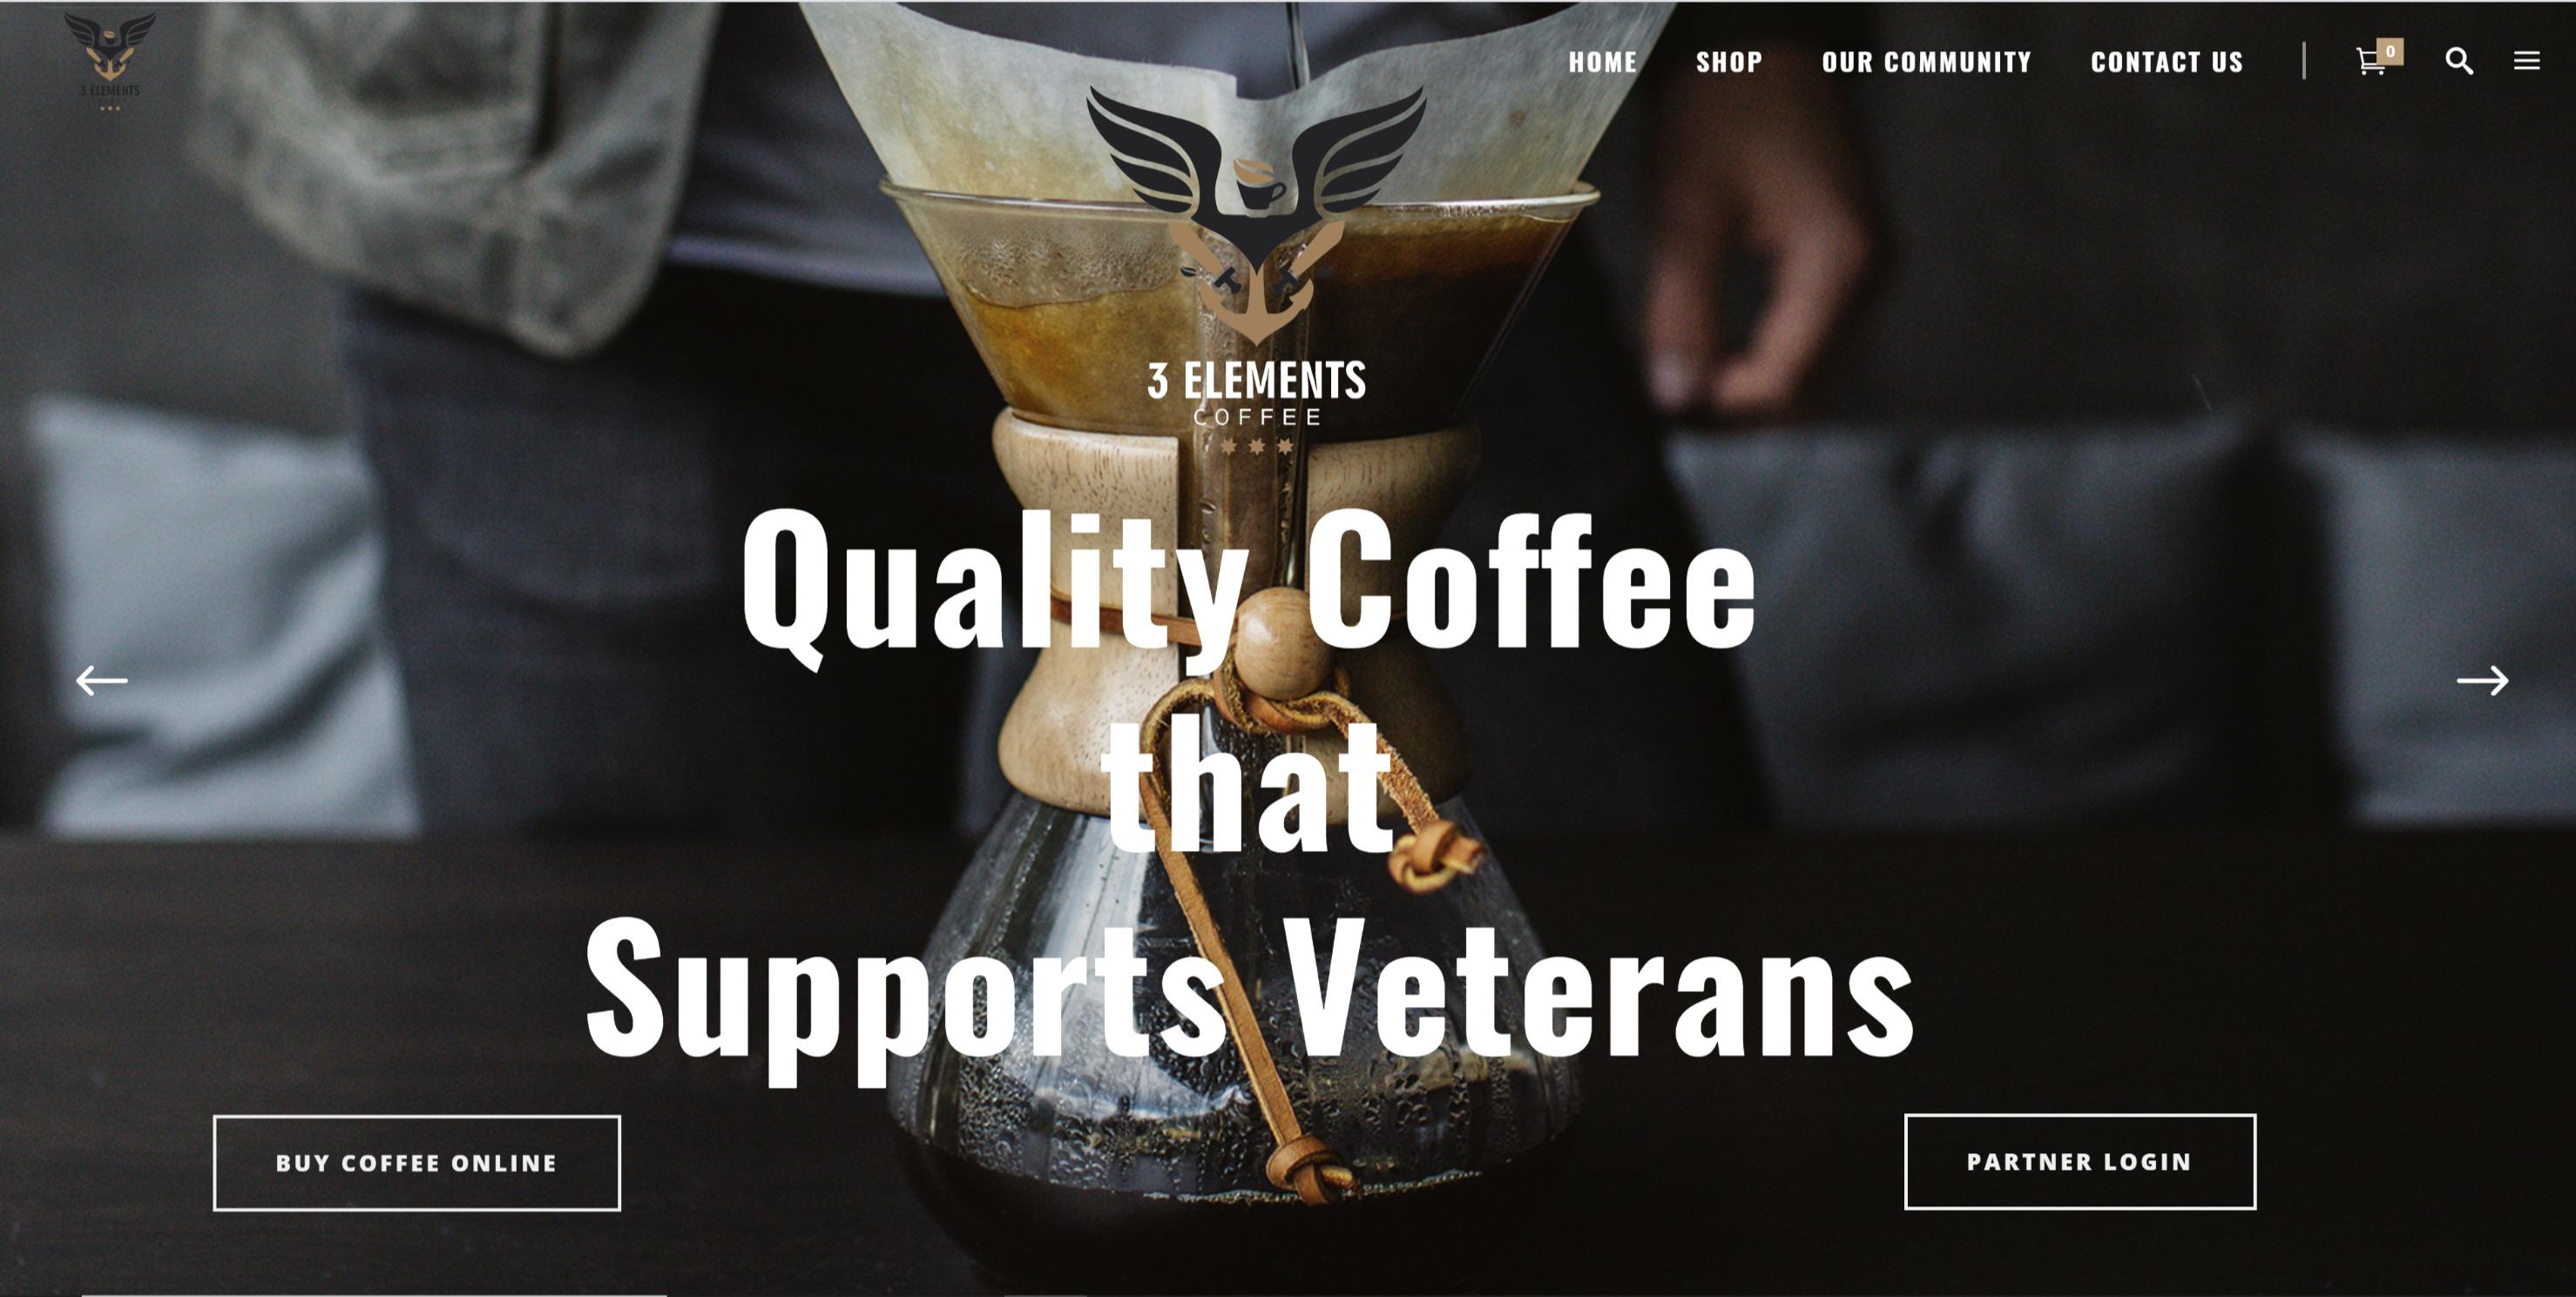 3 Elements Coffee